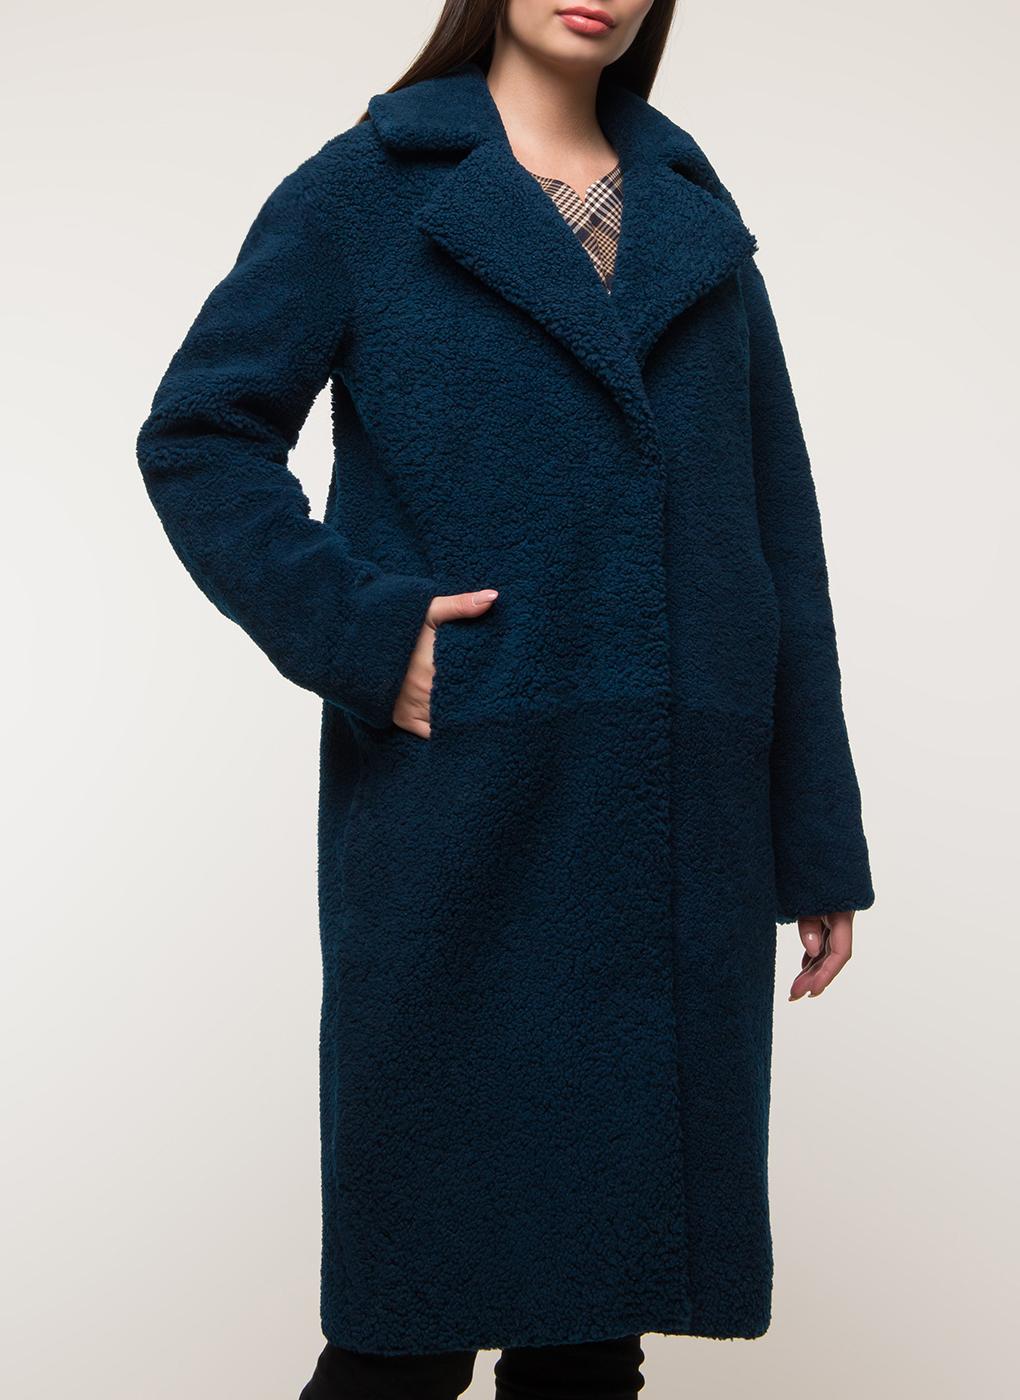 Пальто из овчины 03, Roberto rafio фото